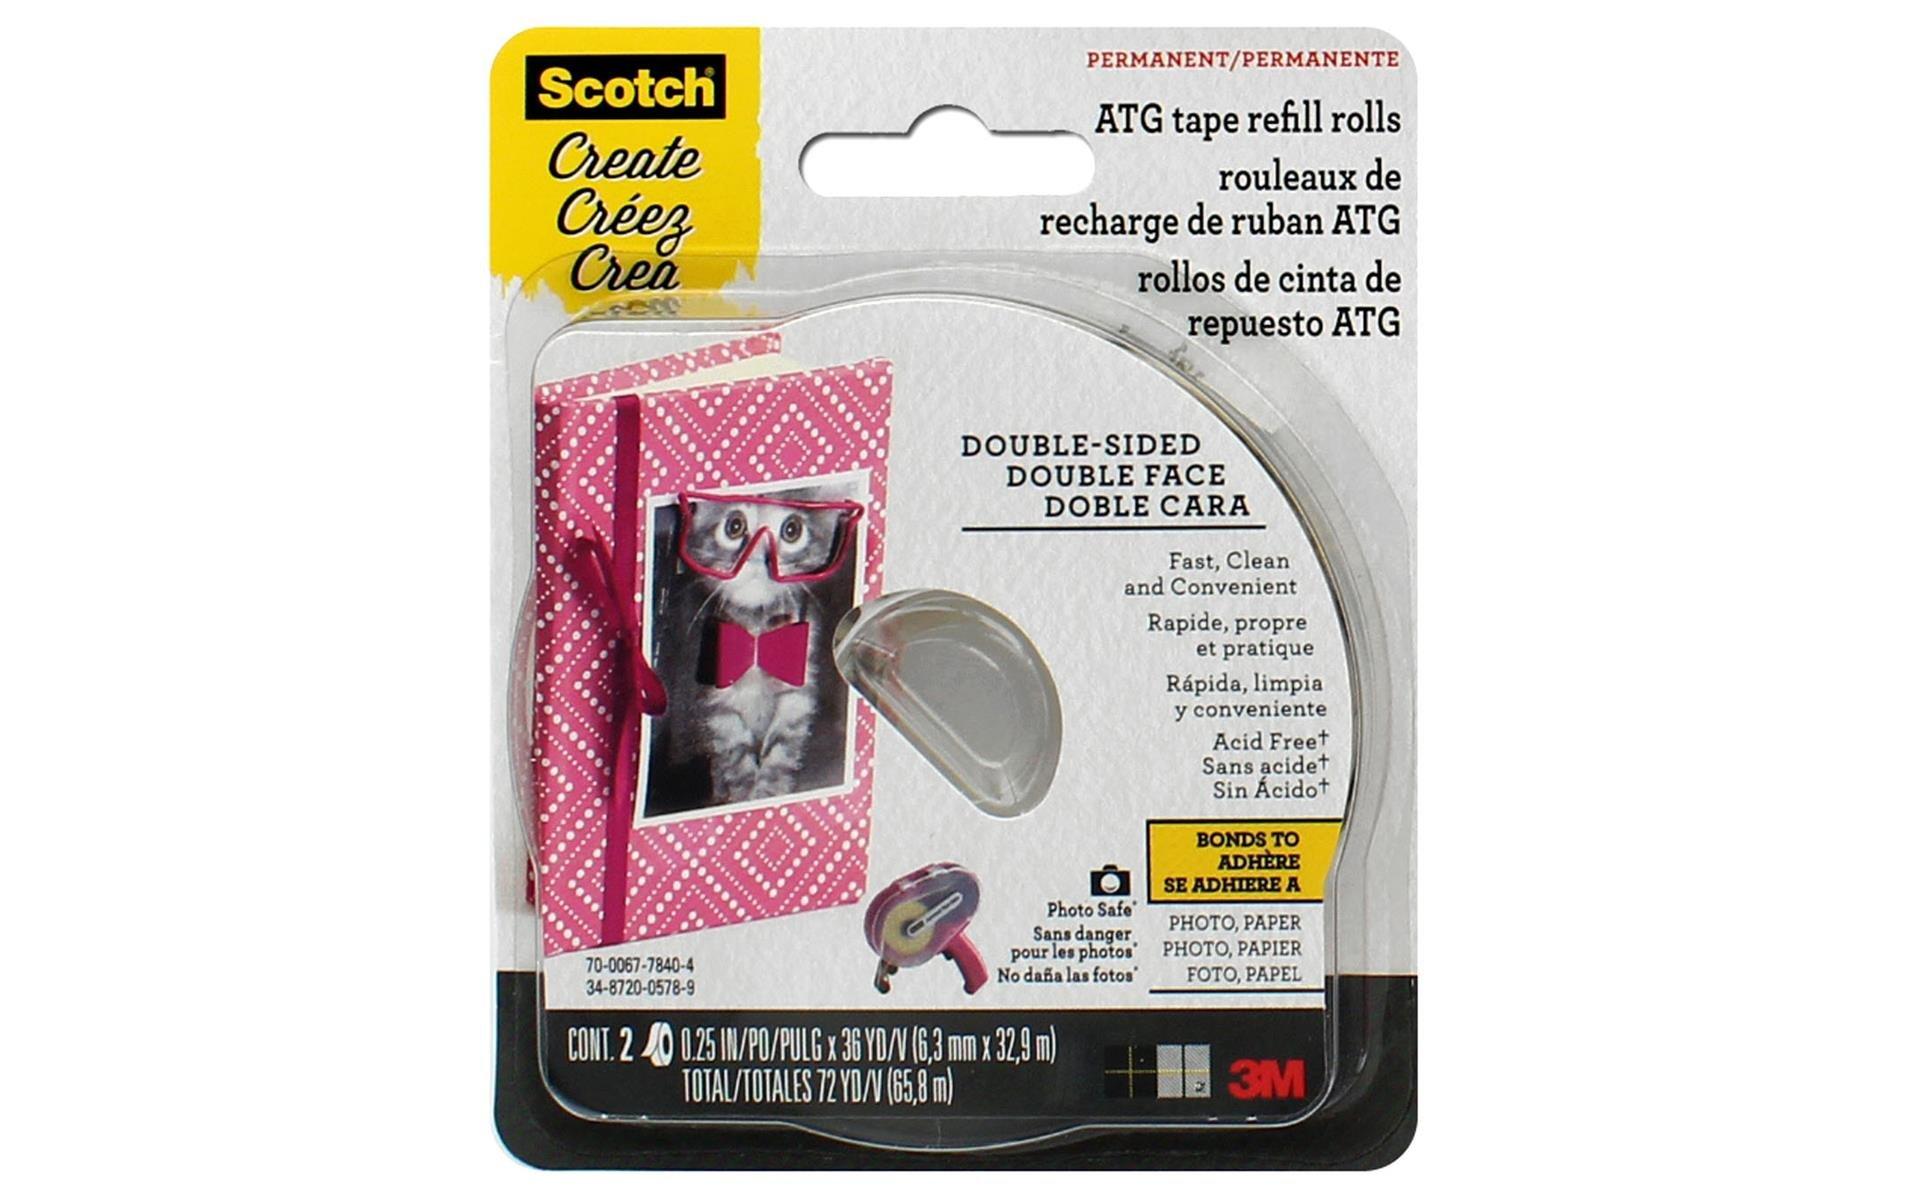 Scotch Advanced Tape Glider Refills - 1/4, 2 pk